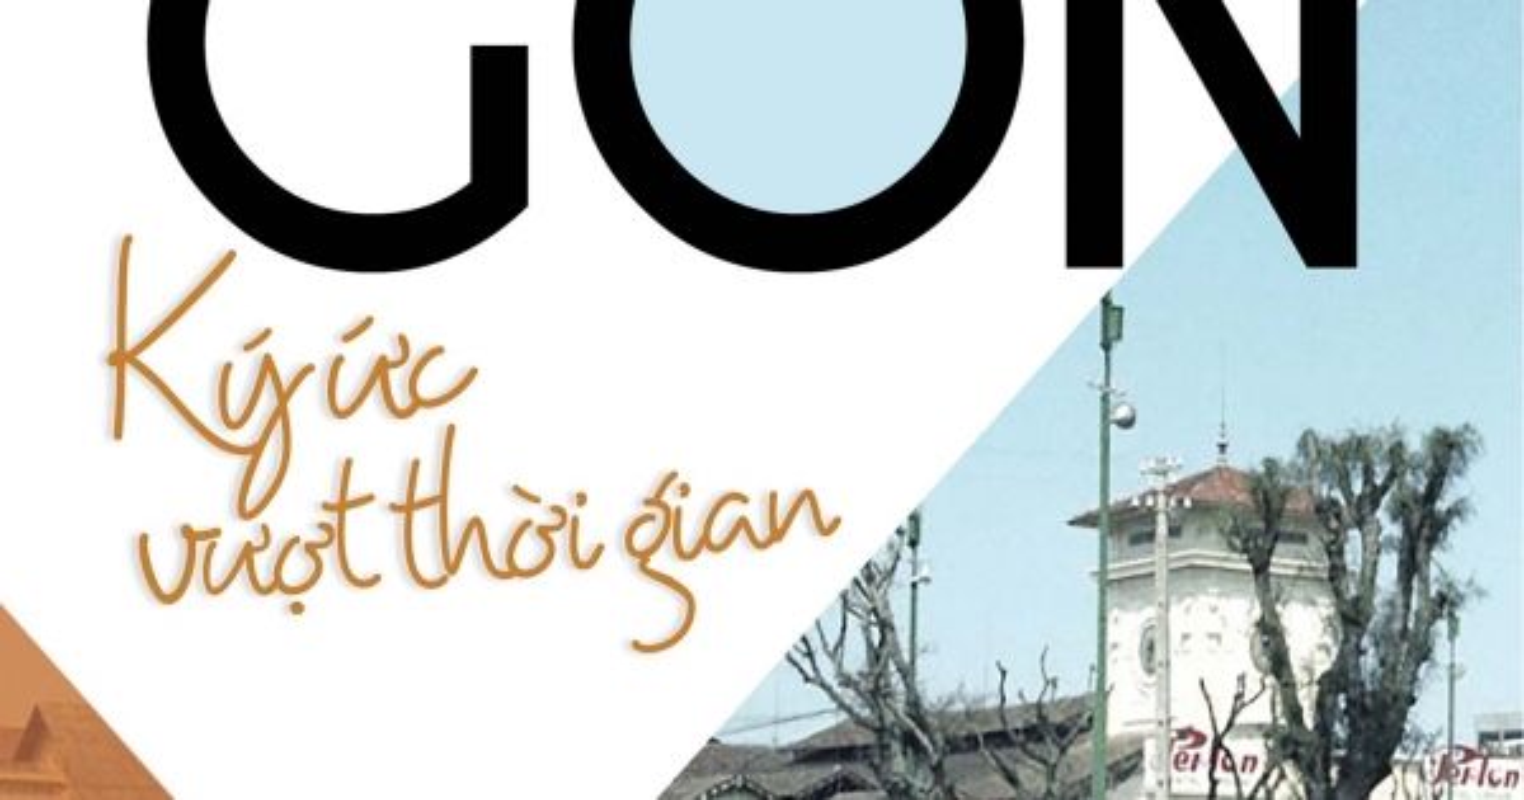 Sai Gon – Ky uc vuot thoi gian-Hinh-2